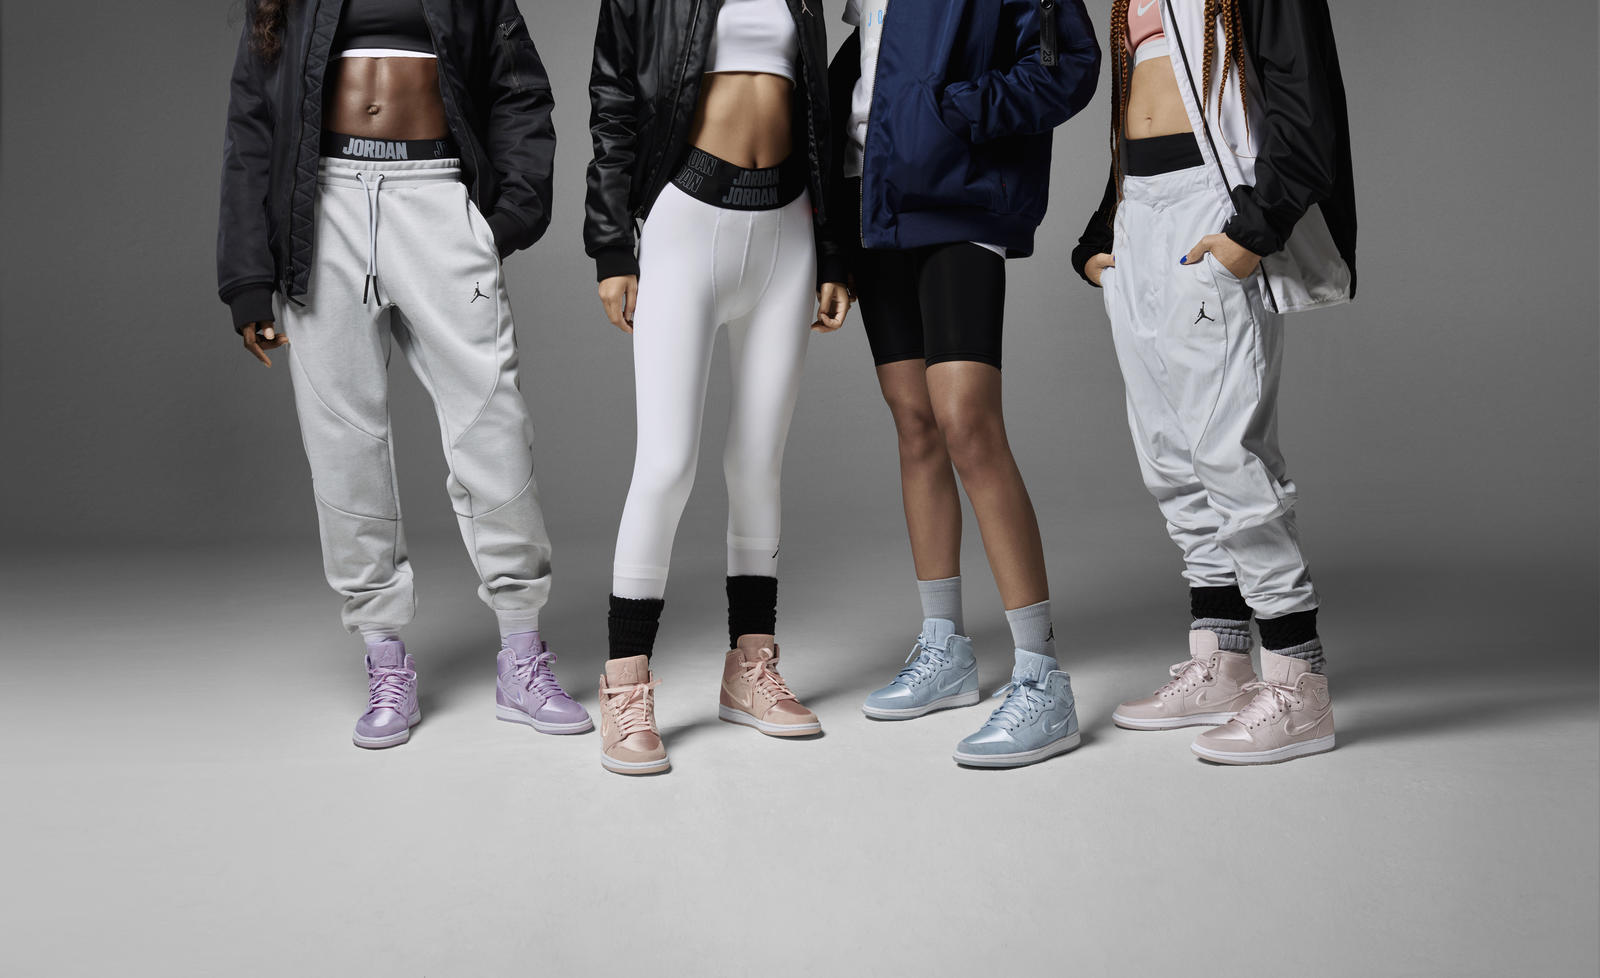 Image via  Nike .